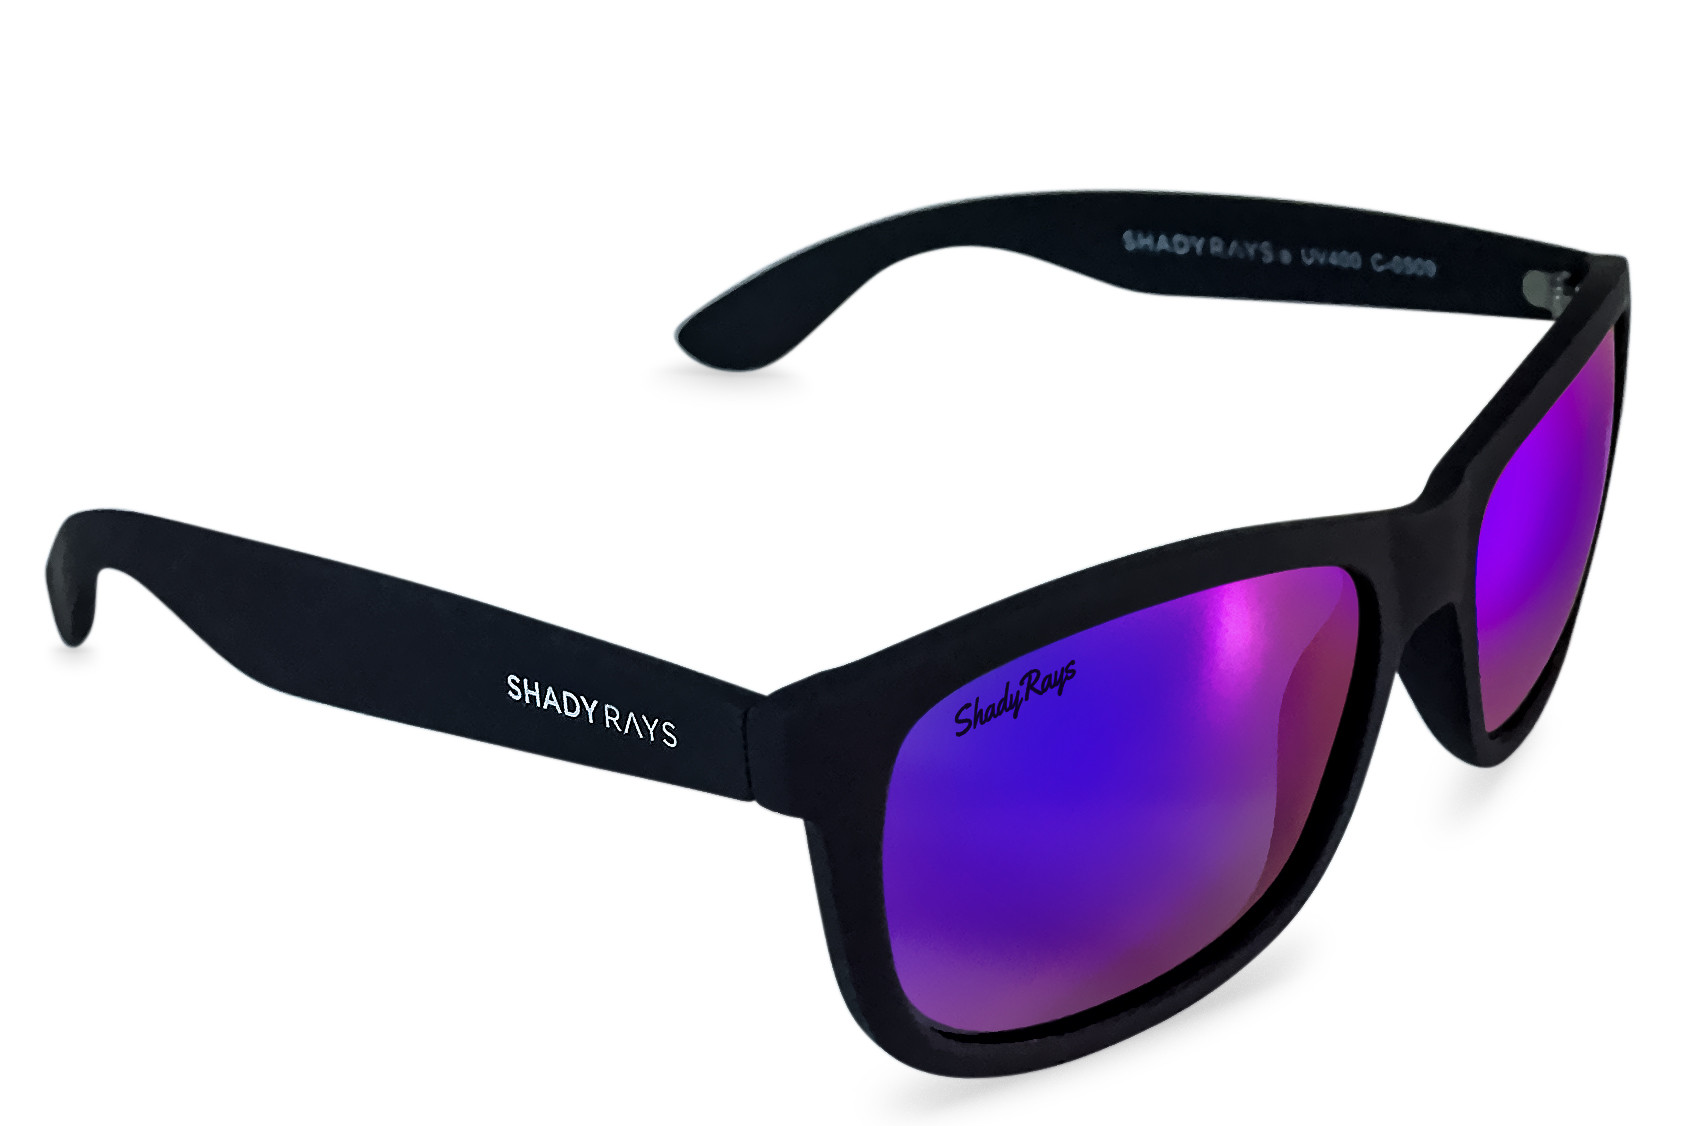 c0e203812b Shady Rays Signature Series Purple Sunset Polarized Sunglasses People